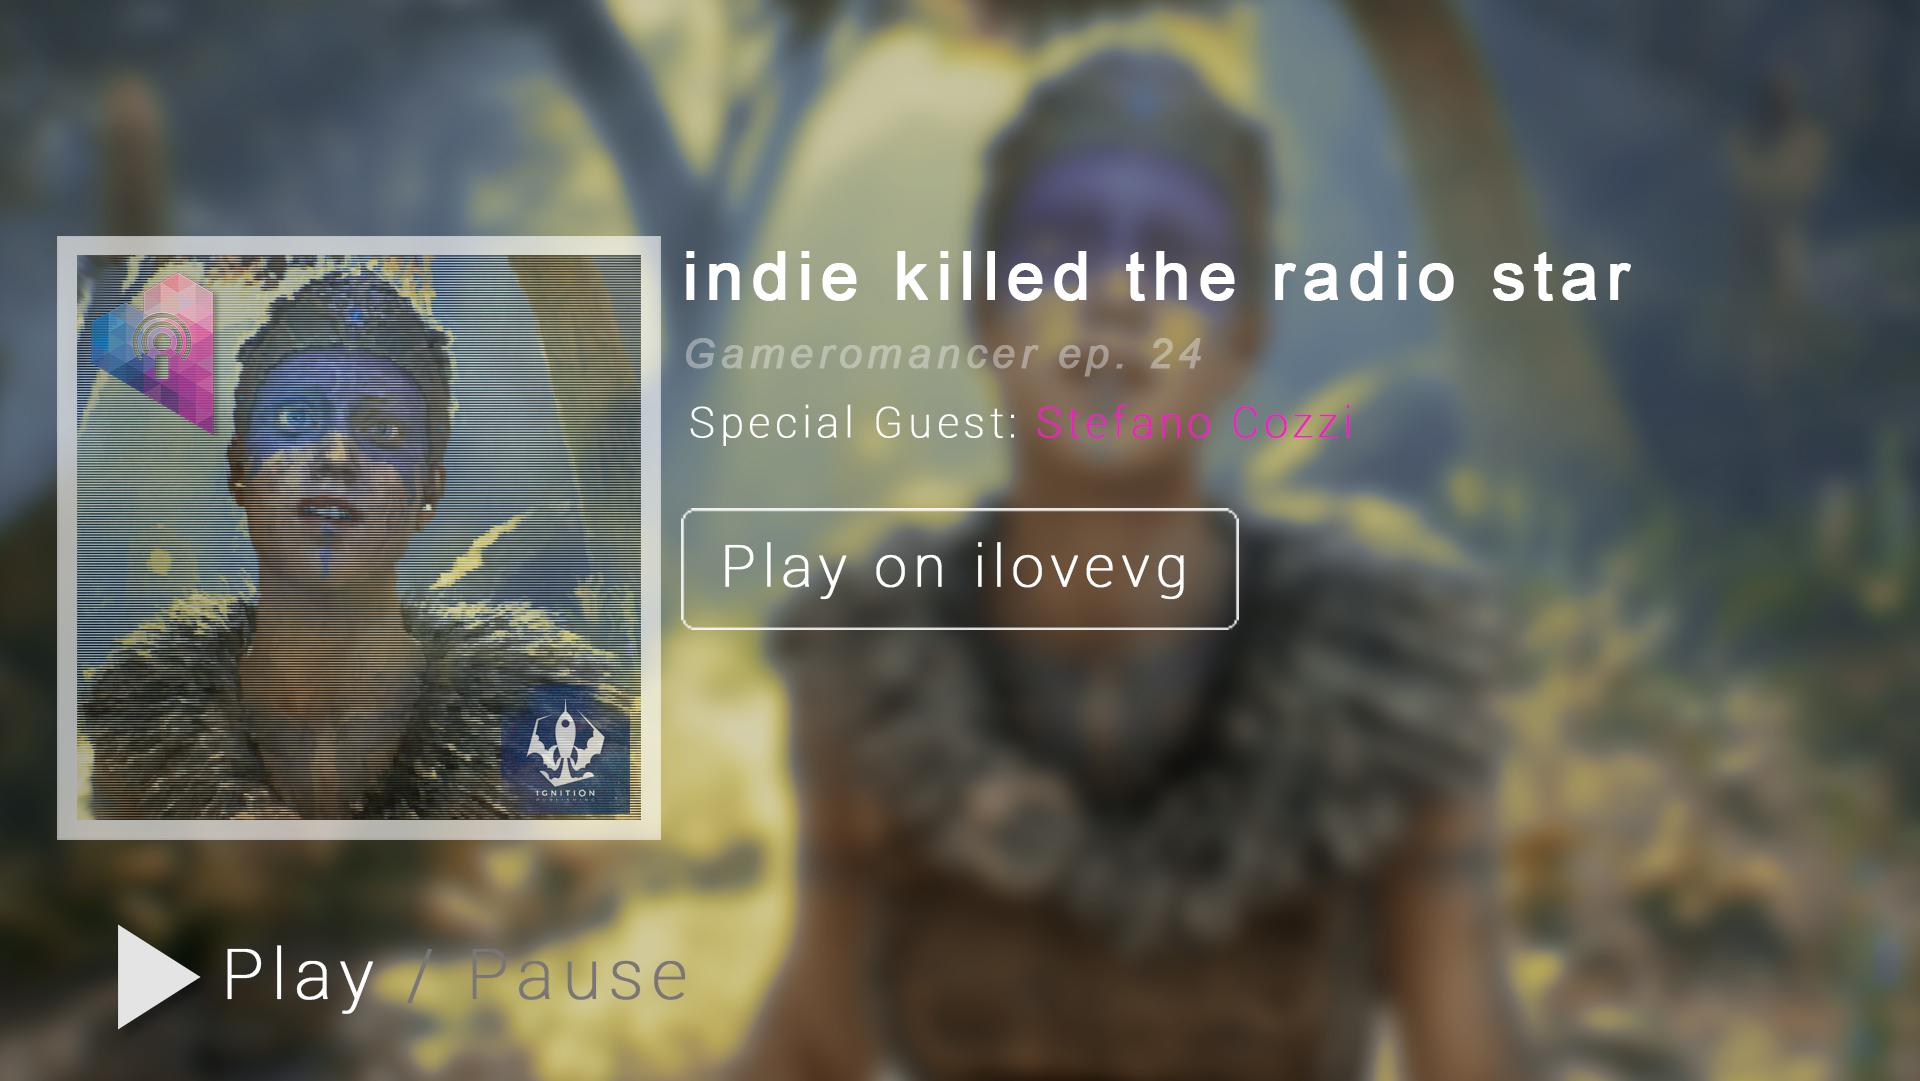 Ep. 24: indie killed the radio star